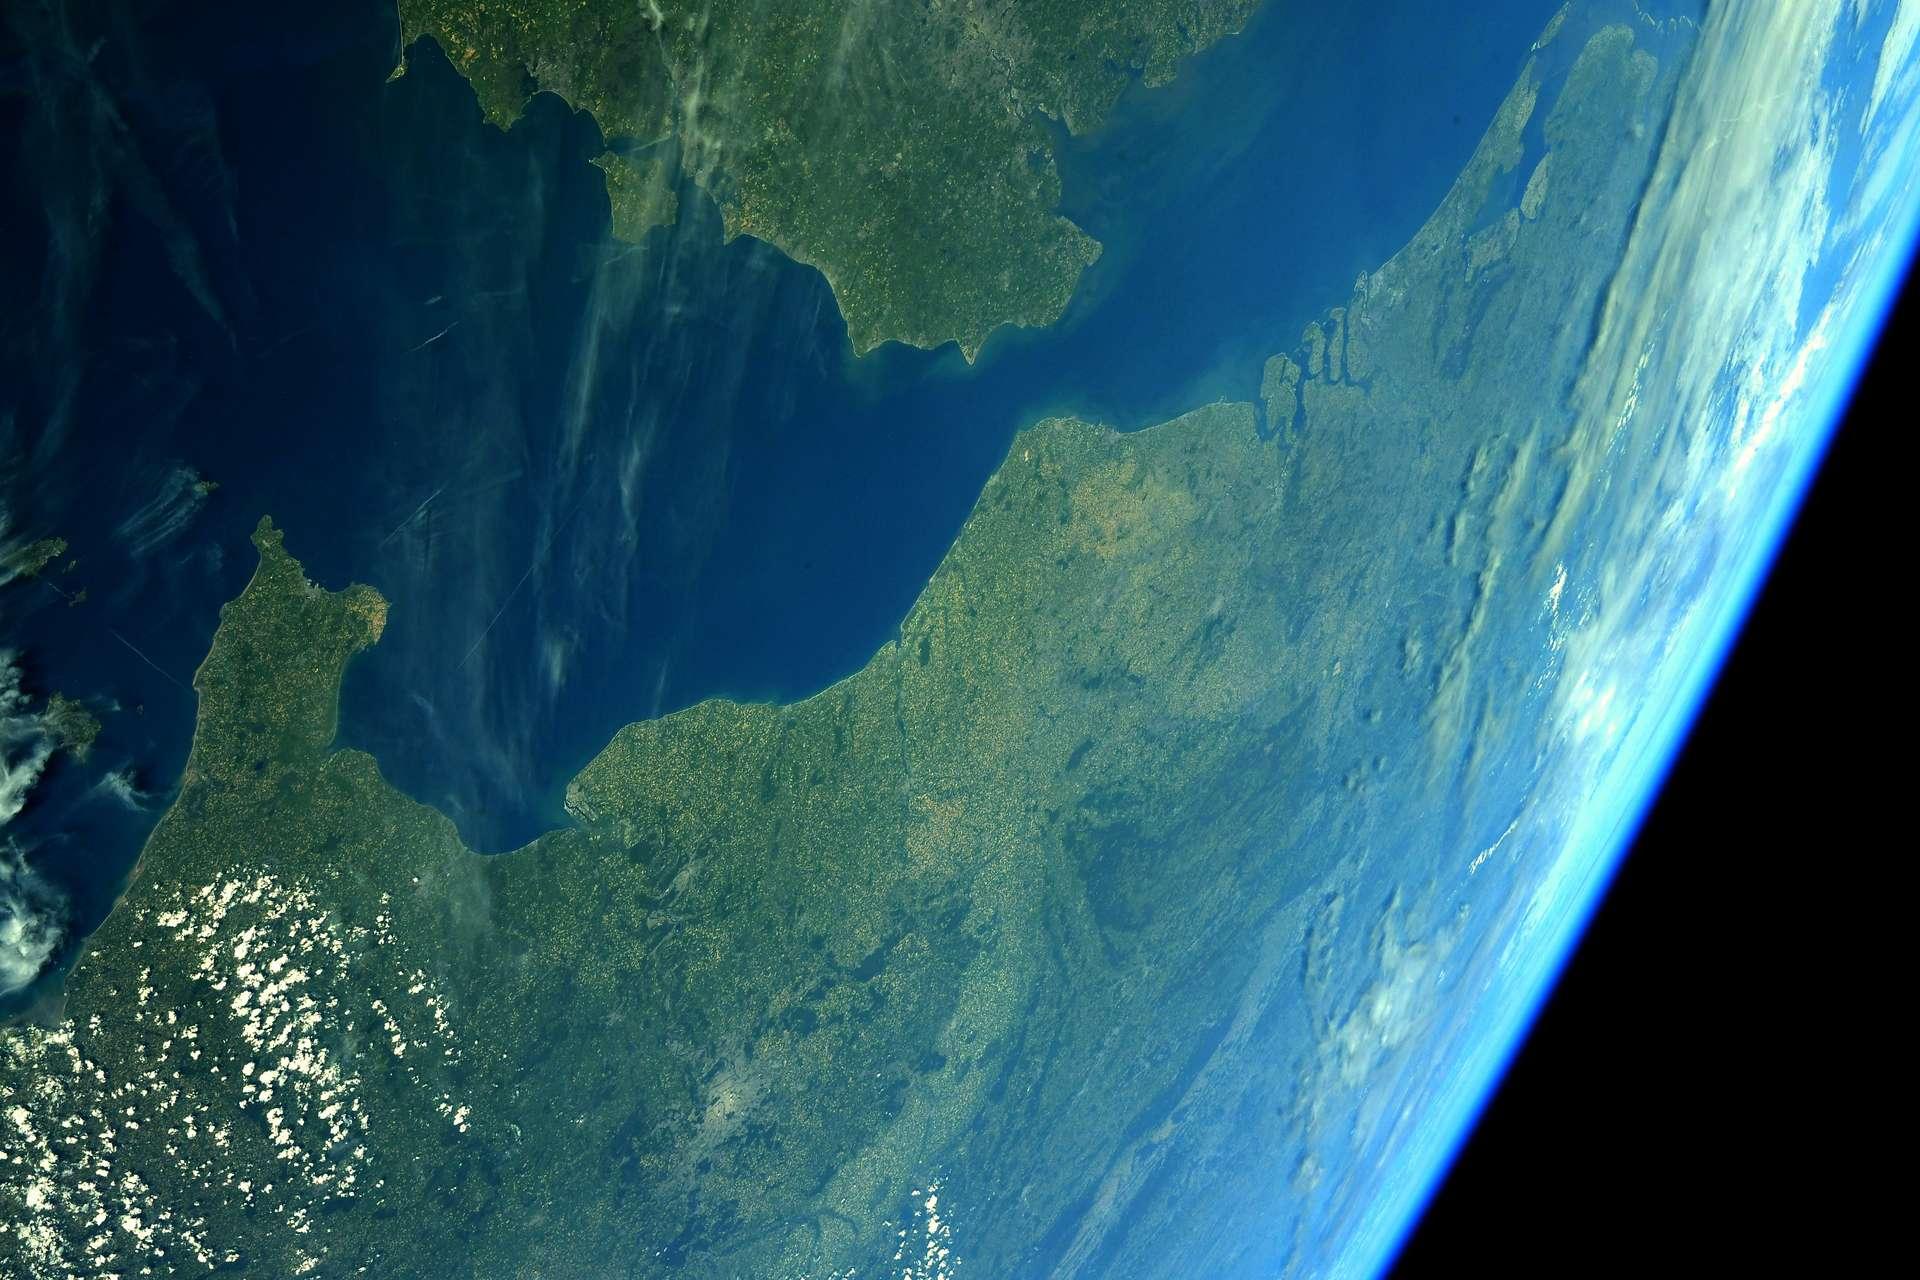 Le Nord-Pas-de-Calais, photographié par l'astronaute français Thomas Pesquet, en 2021. © ESA, Nasa, Thomas Pesquet